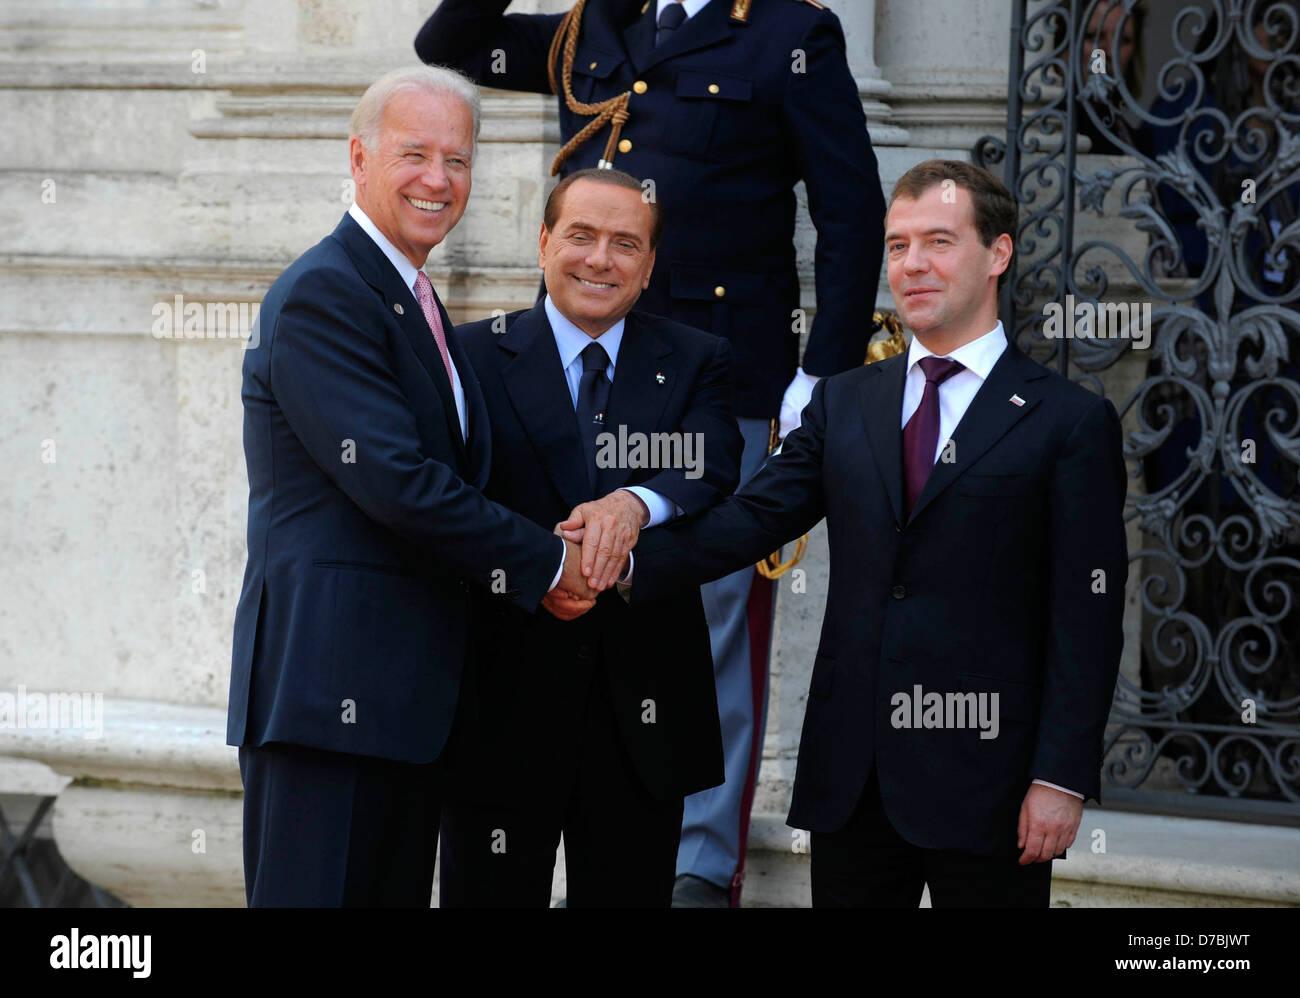 US Vice President Joe Biden meets Italian Prime Minister Silvio Berlusconi and Russian President Dmitry Medvedev Stock Photo